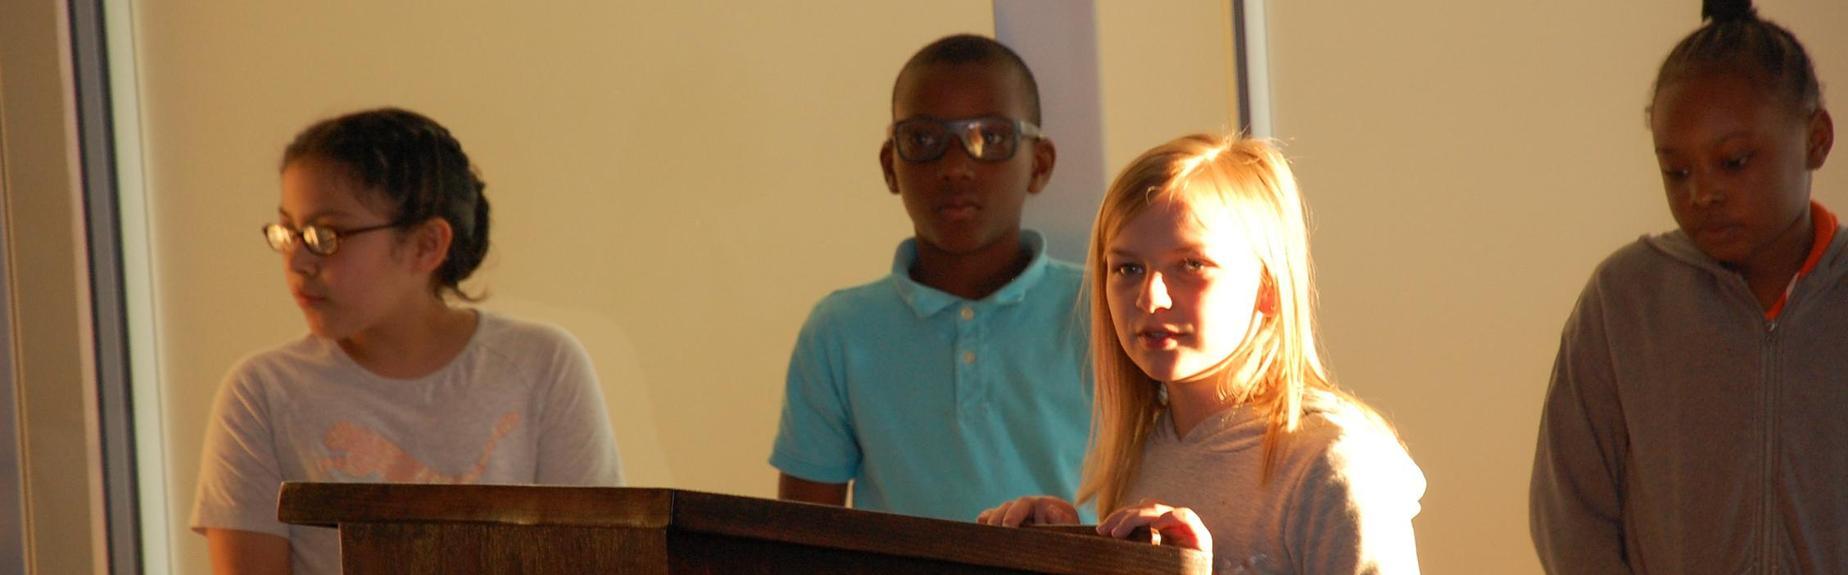 students standing at podium presenting at a board meeting